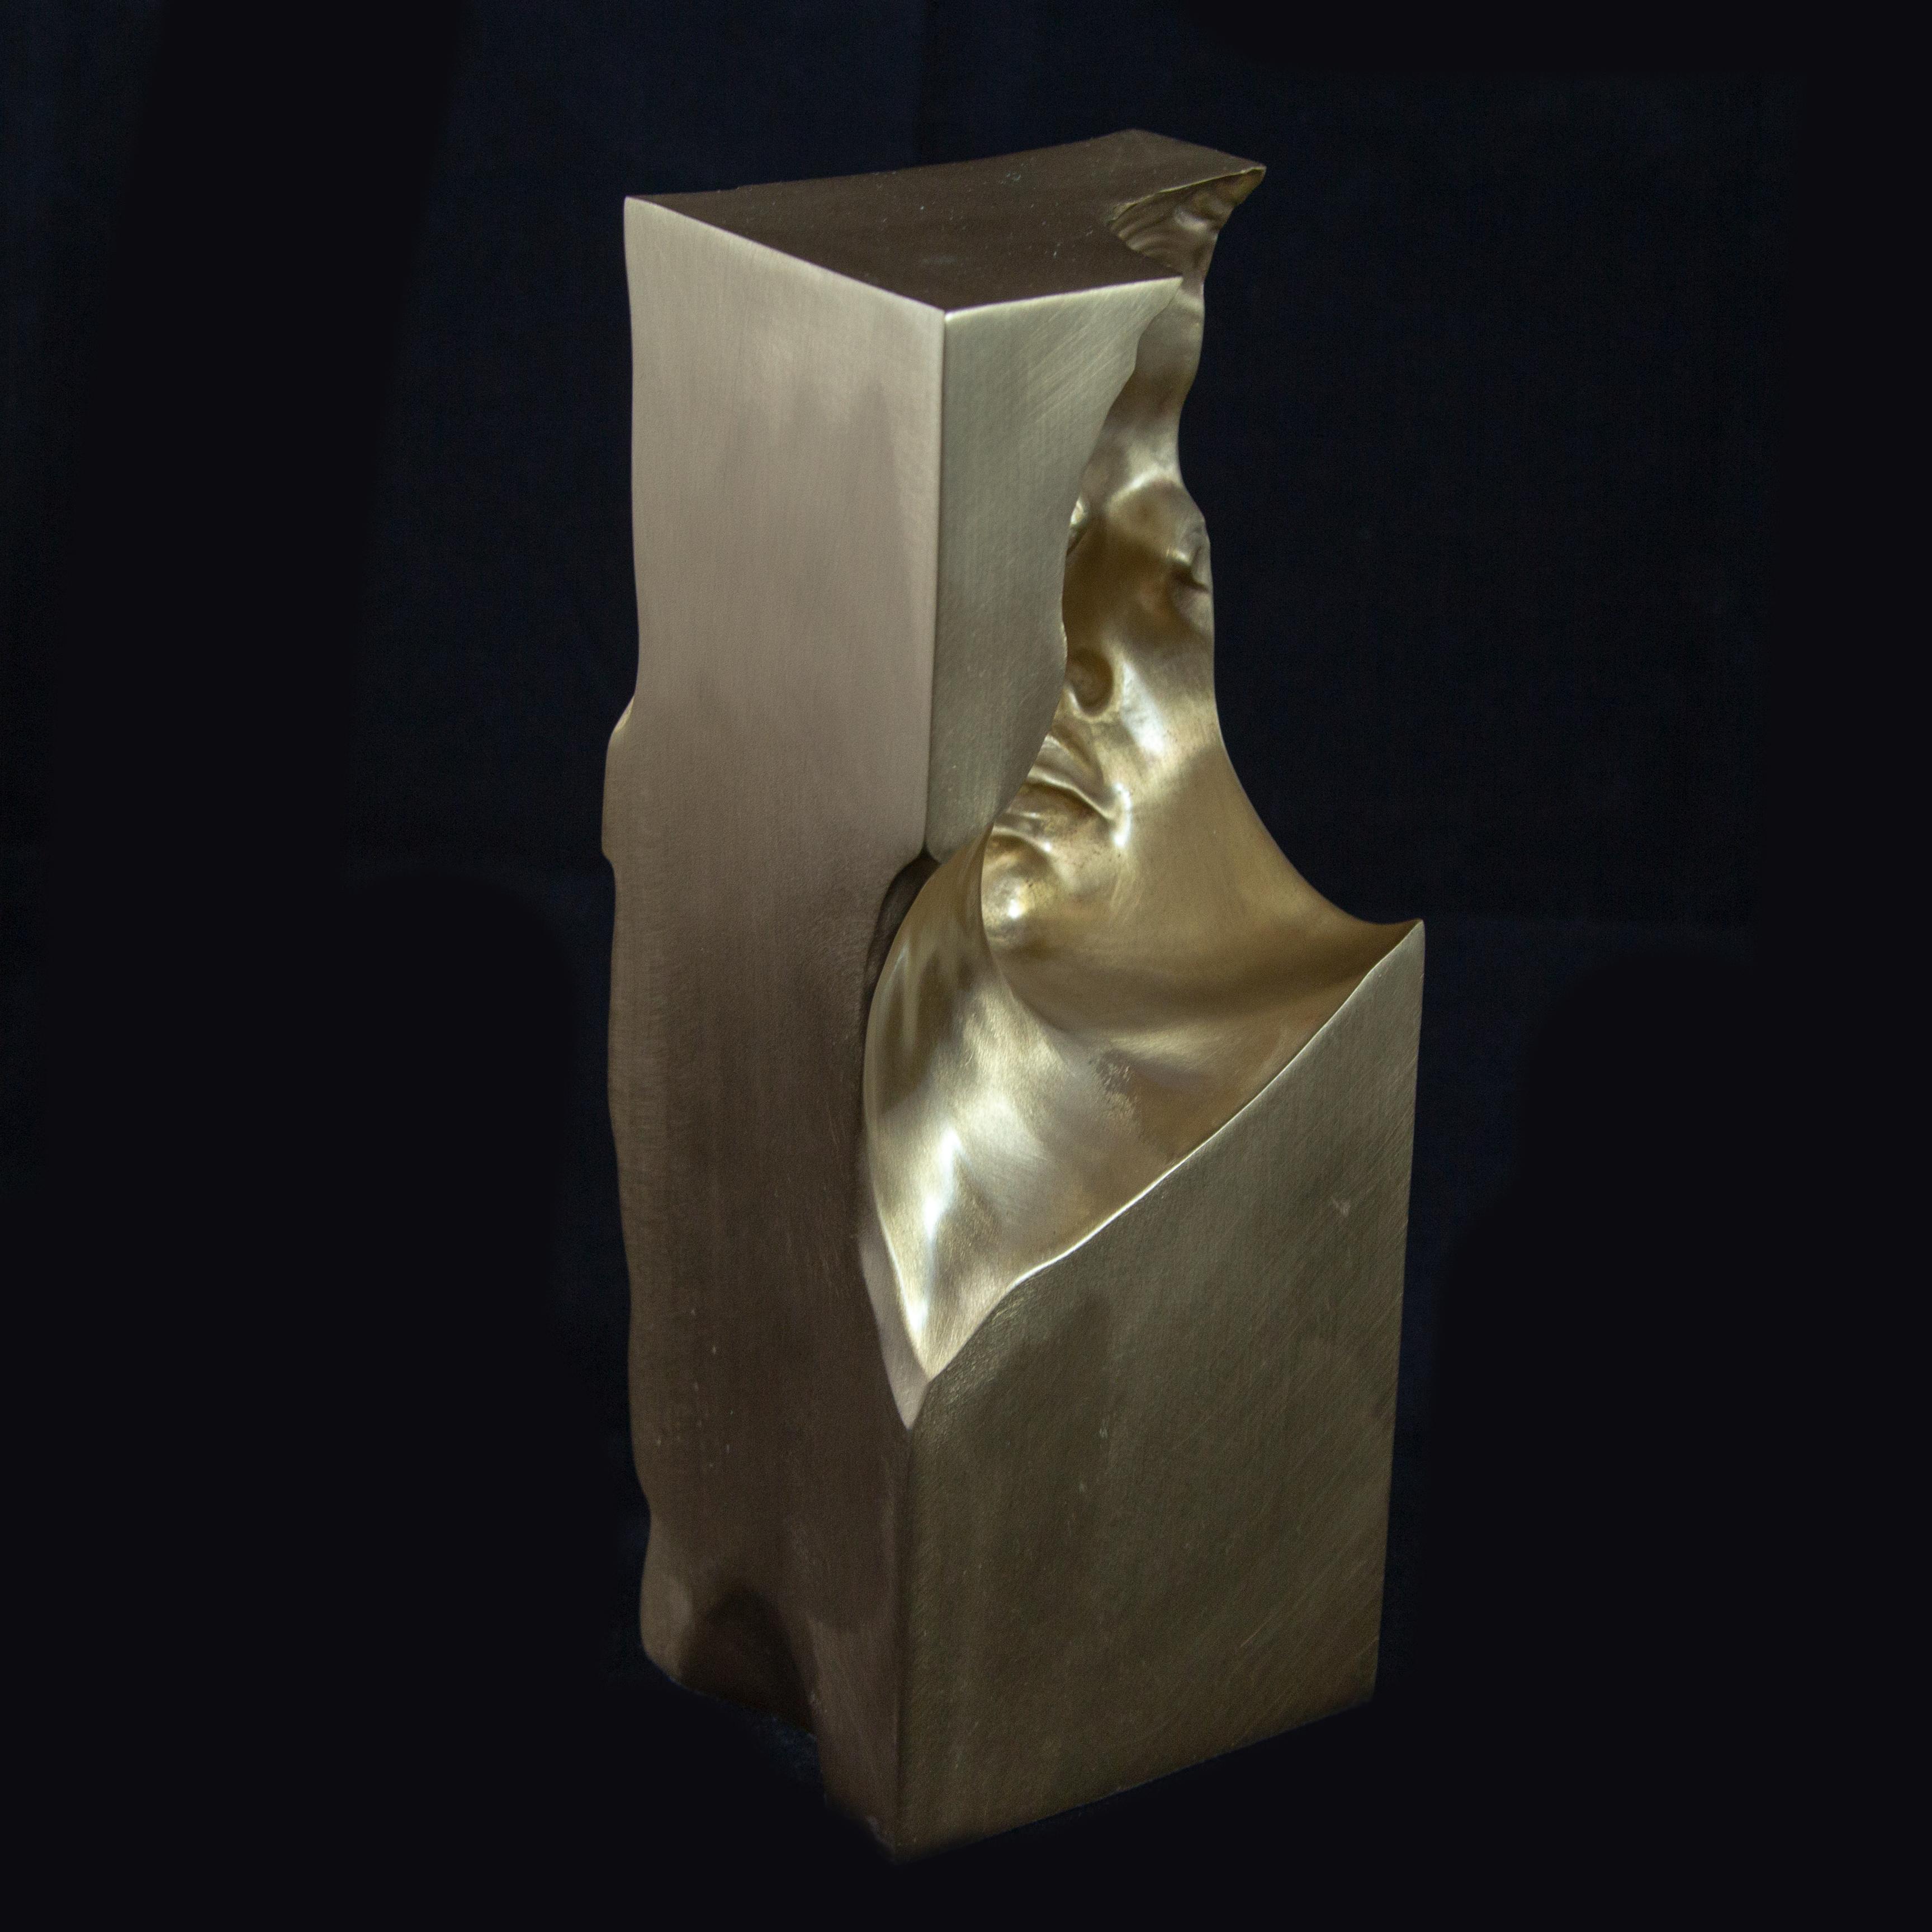 Matteo Mauro - Raw Bronze Sculpture